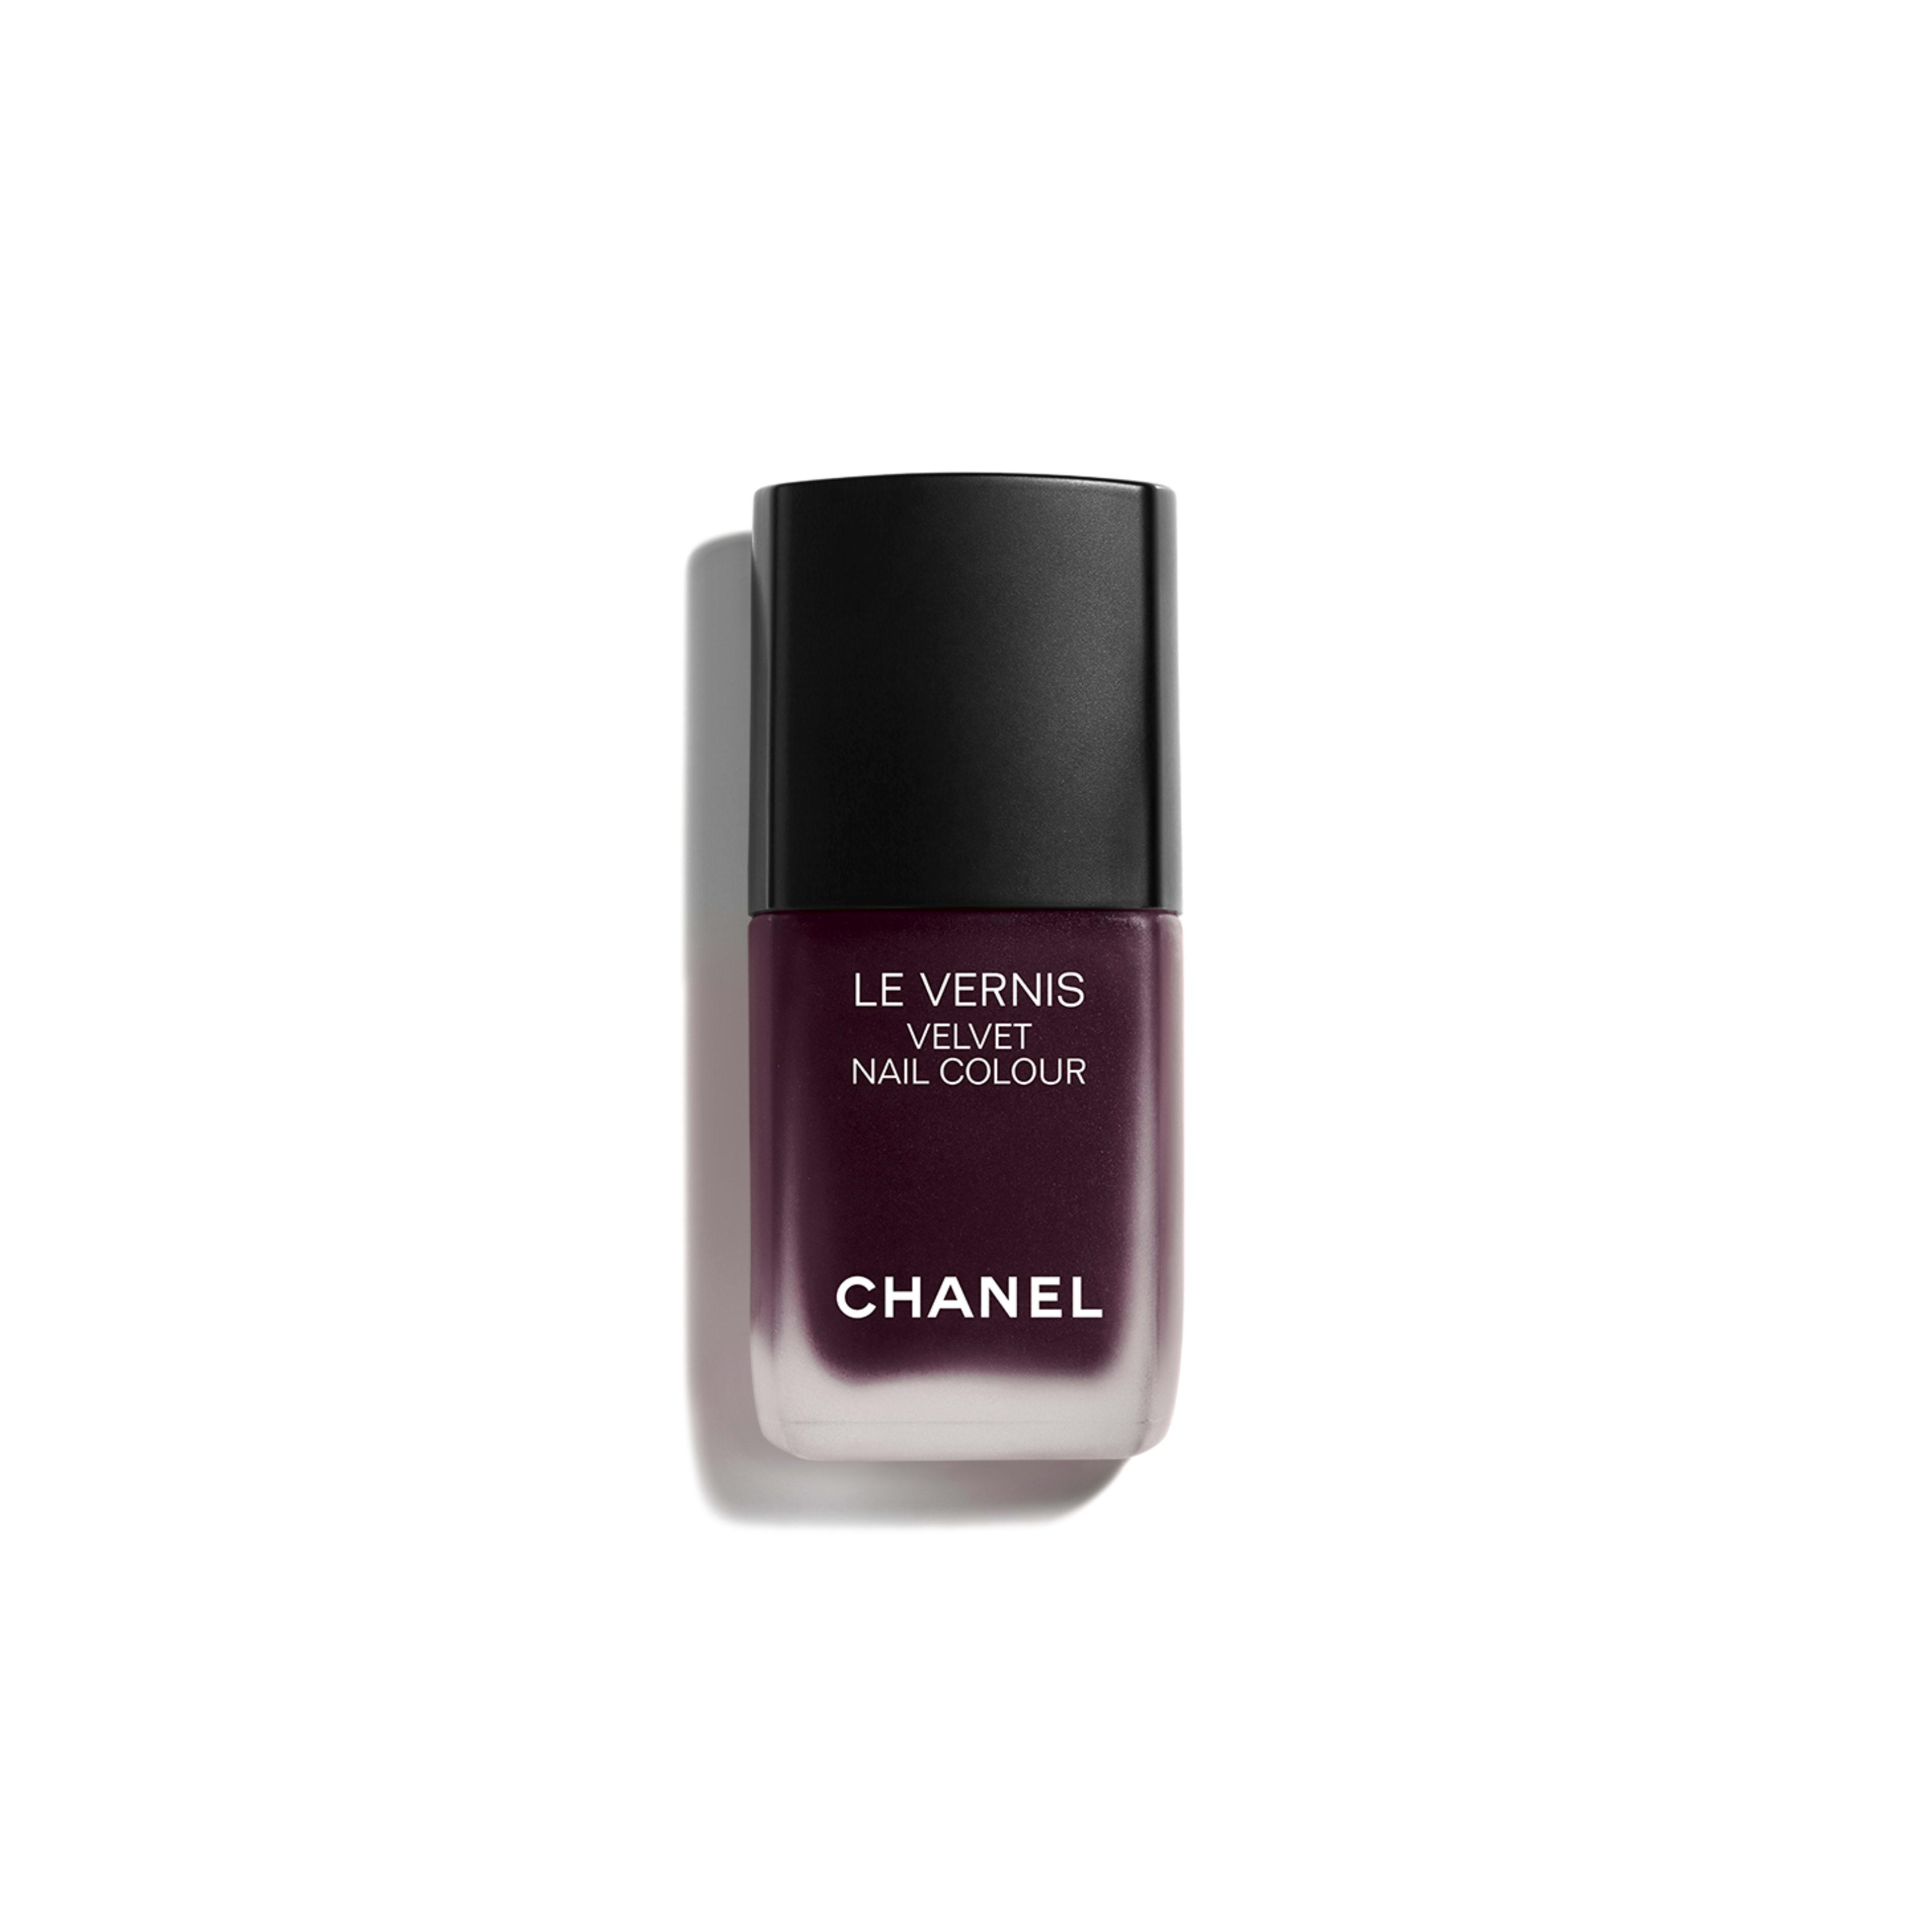 c58fcf7bda6 Fall-Winter Makeup Collection 2018 | CHANEL